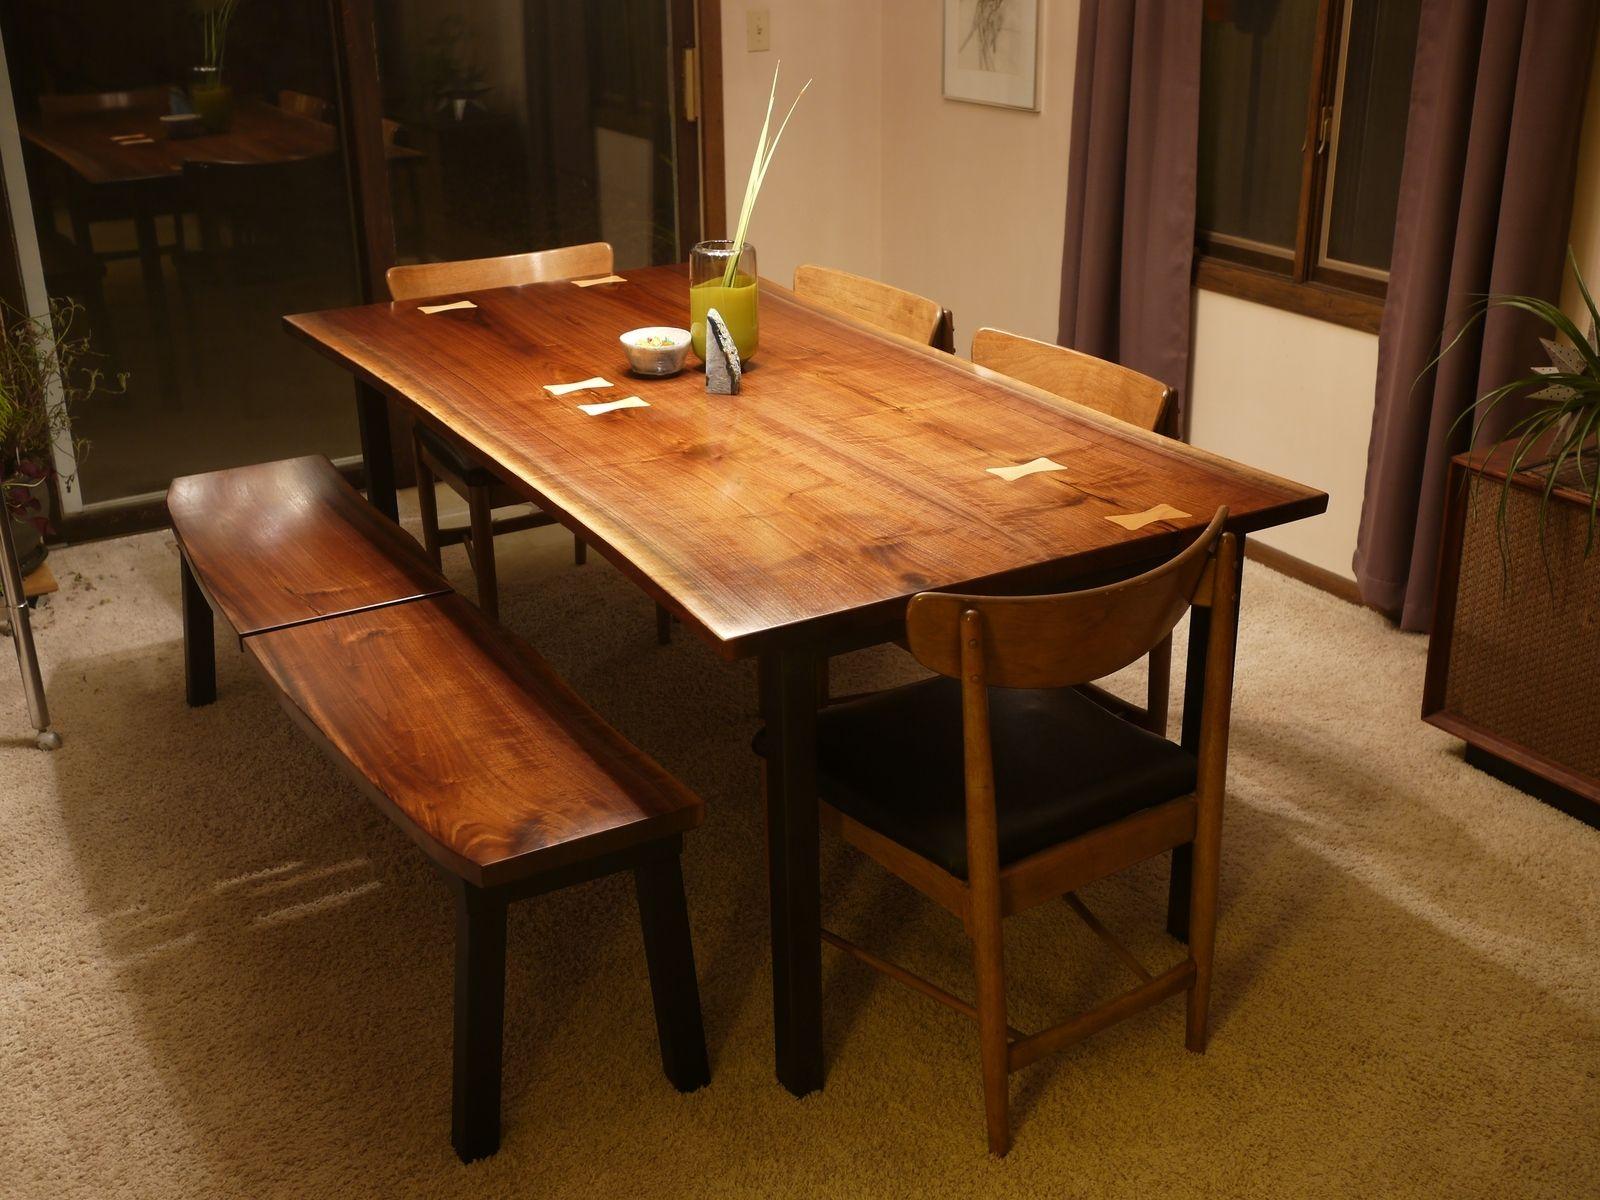 Custom Modern Walnut Dining Set With Maple Inlay by Tree